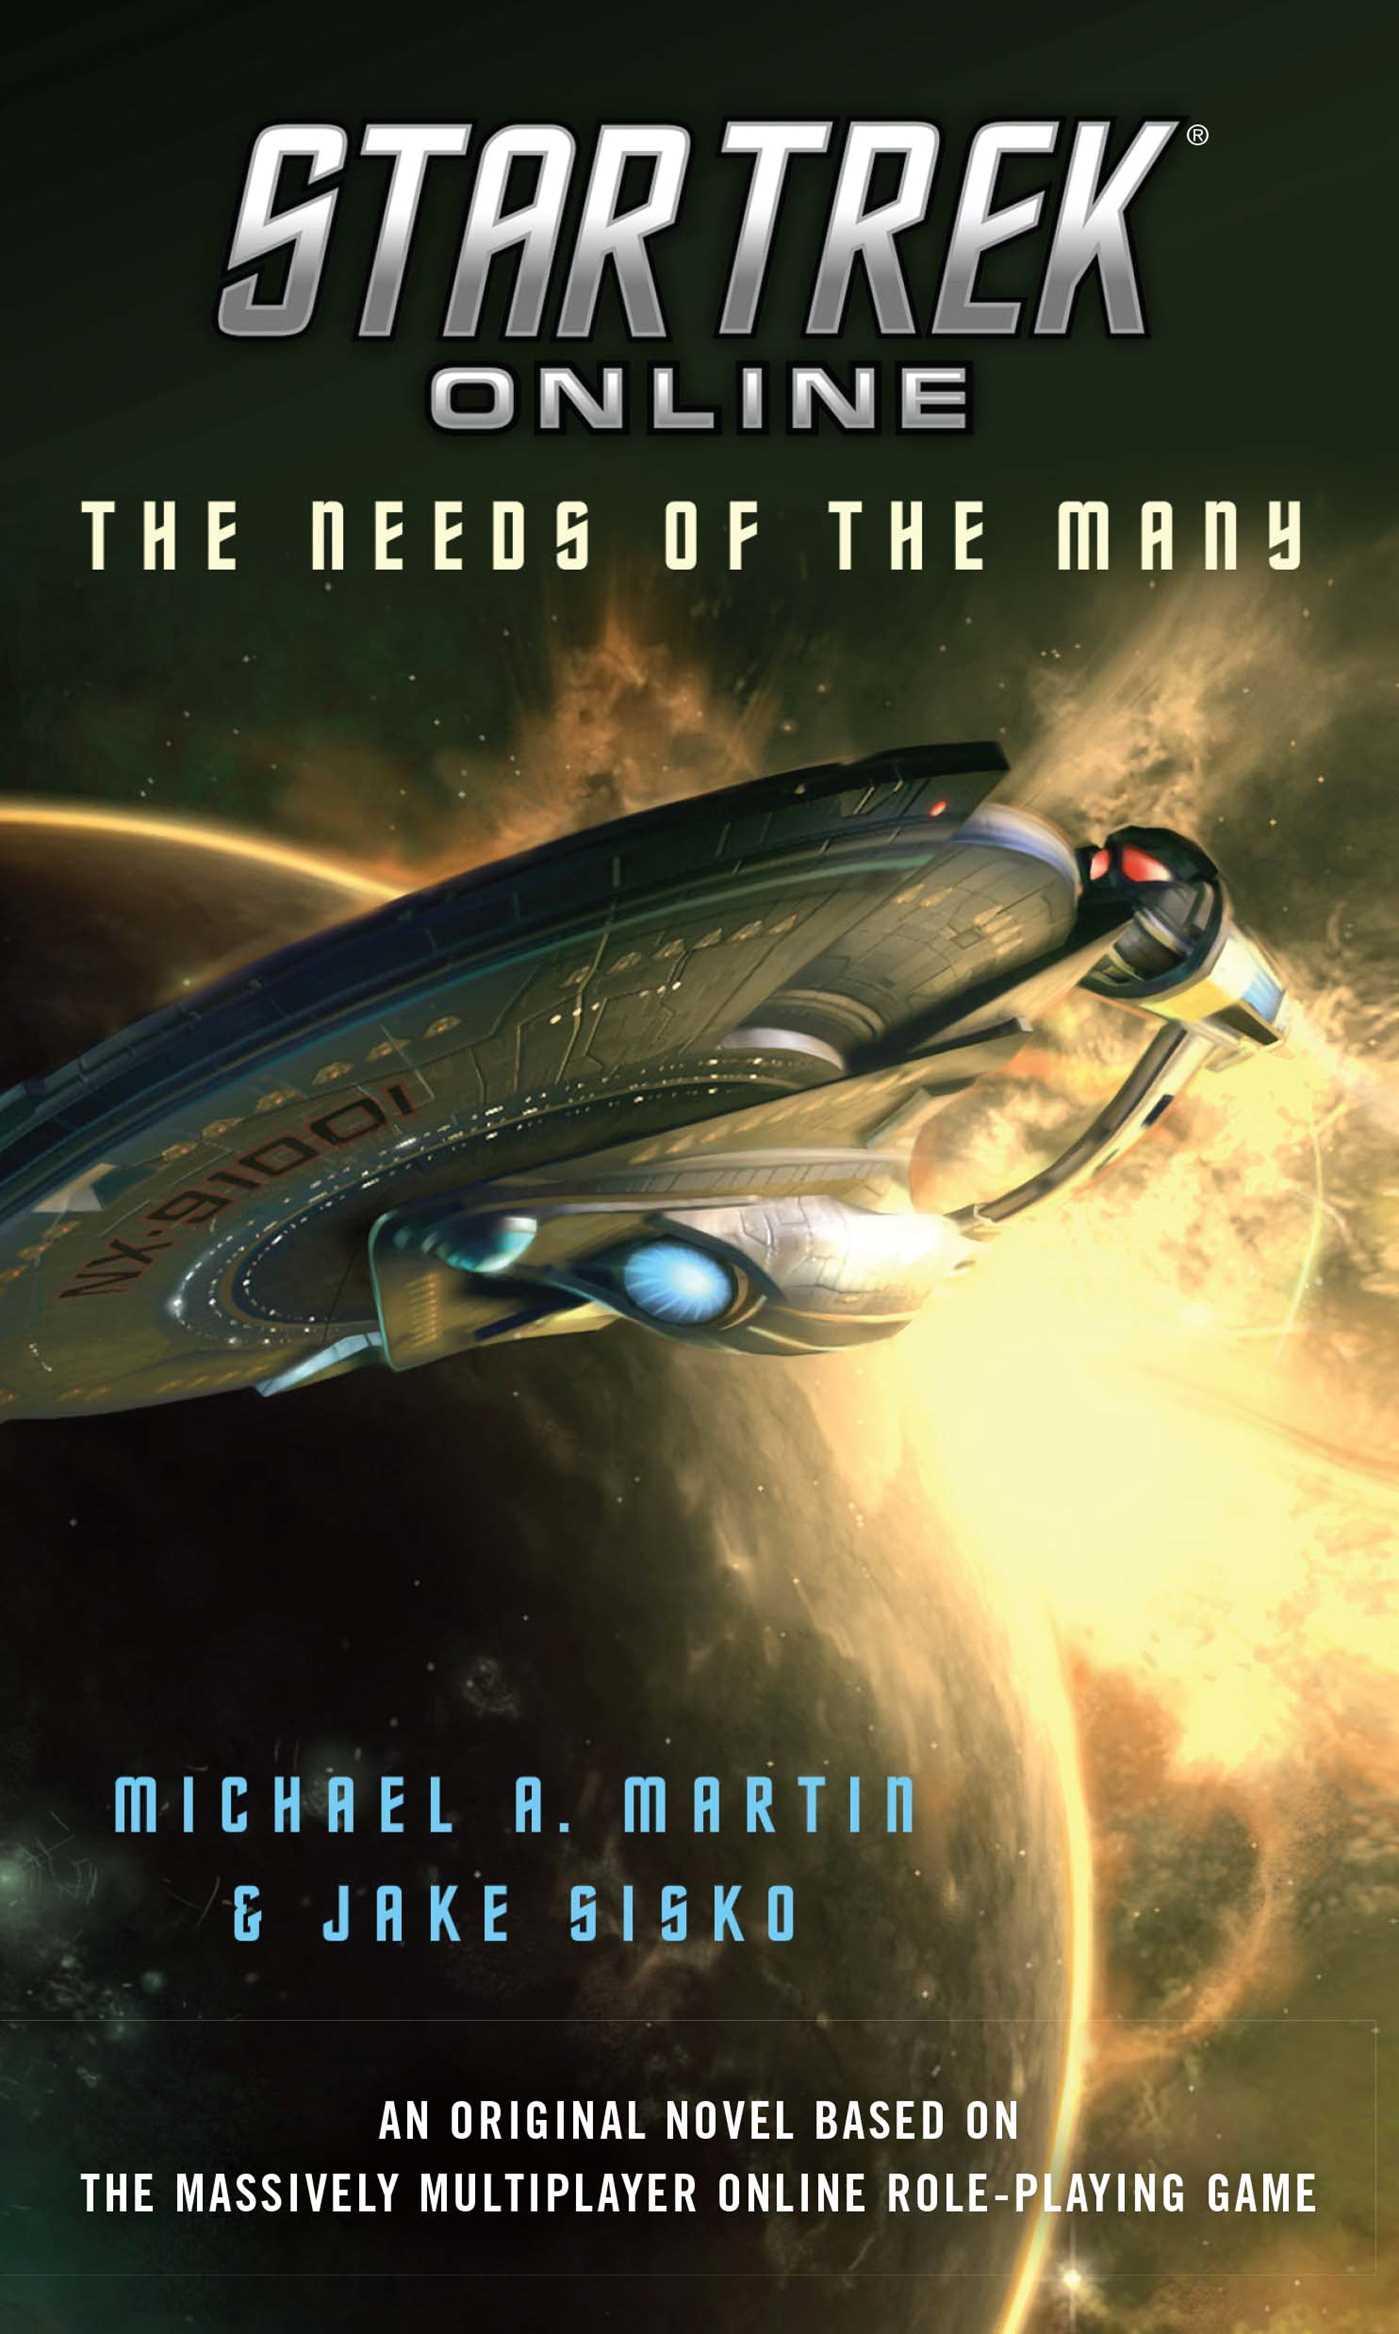 Star trek online the needs of the many 9781439186589 hr